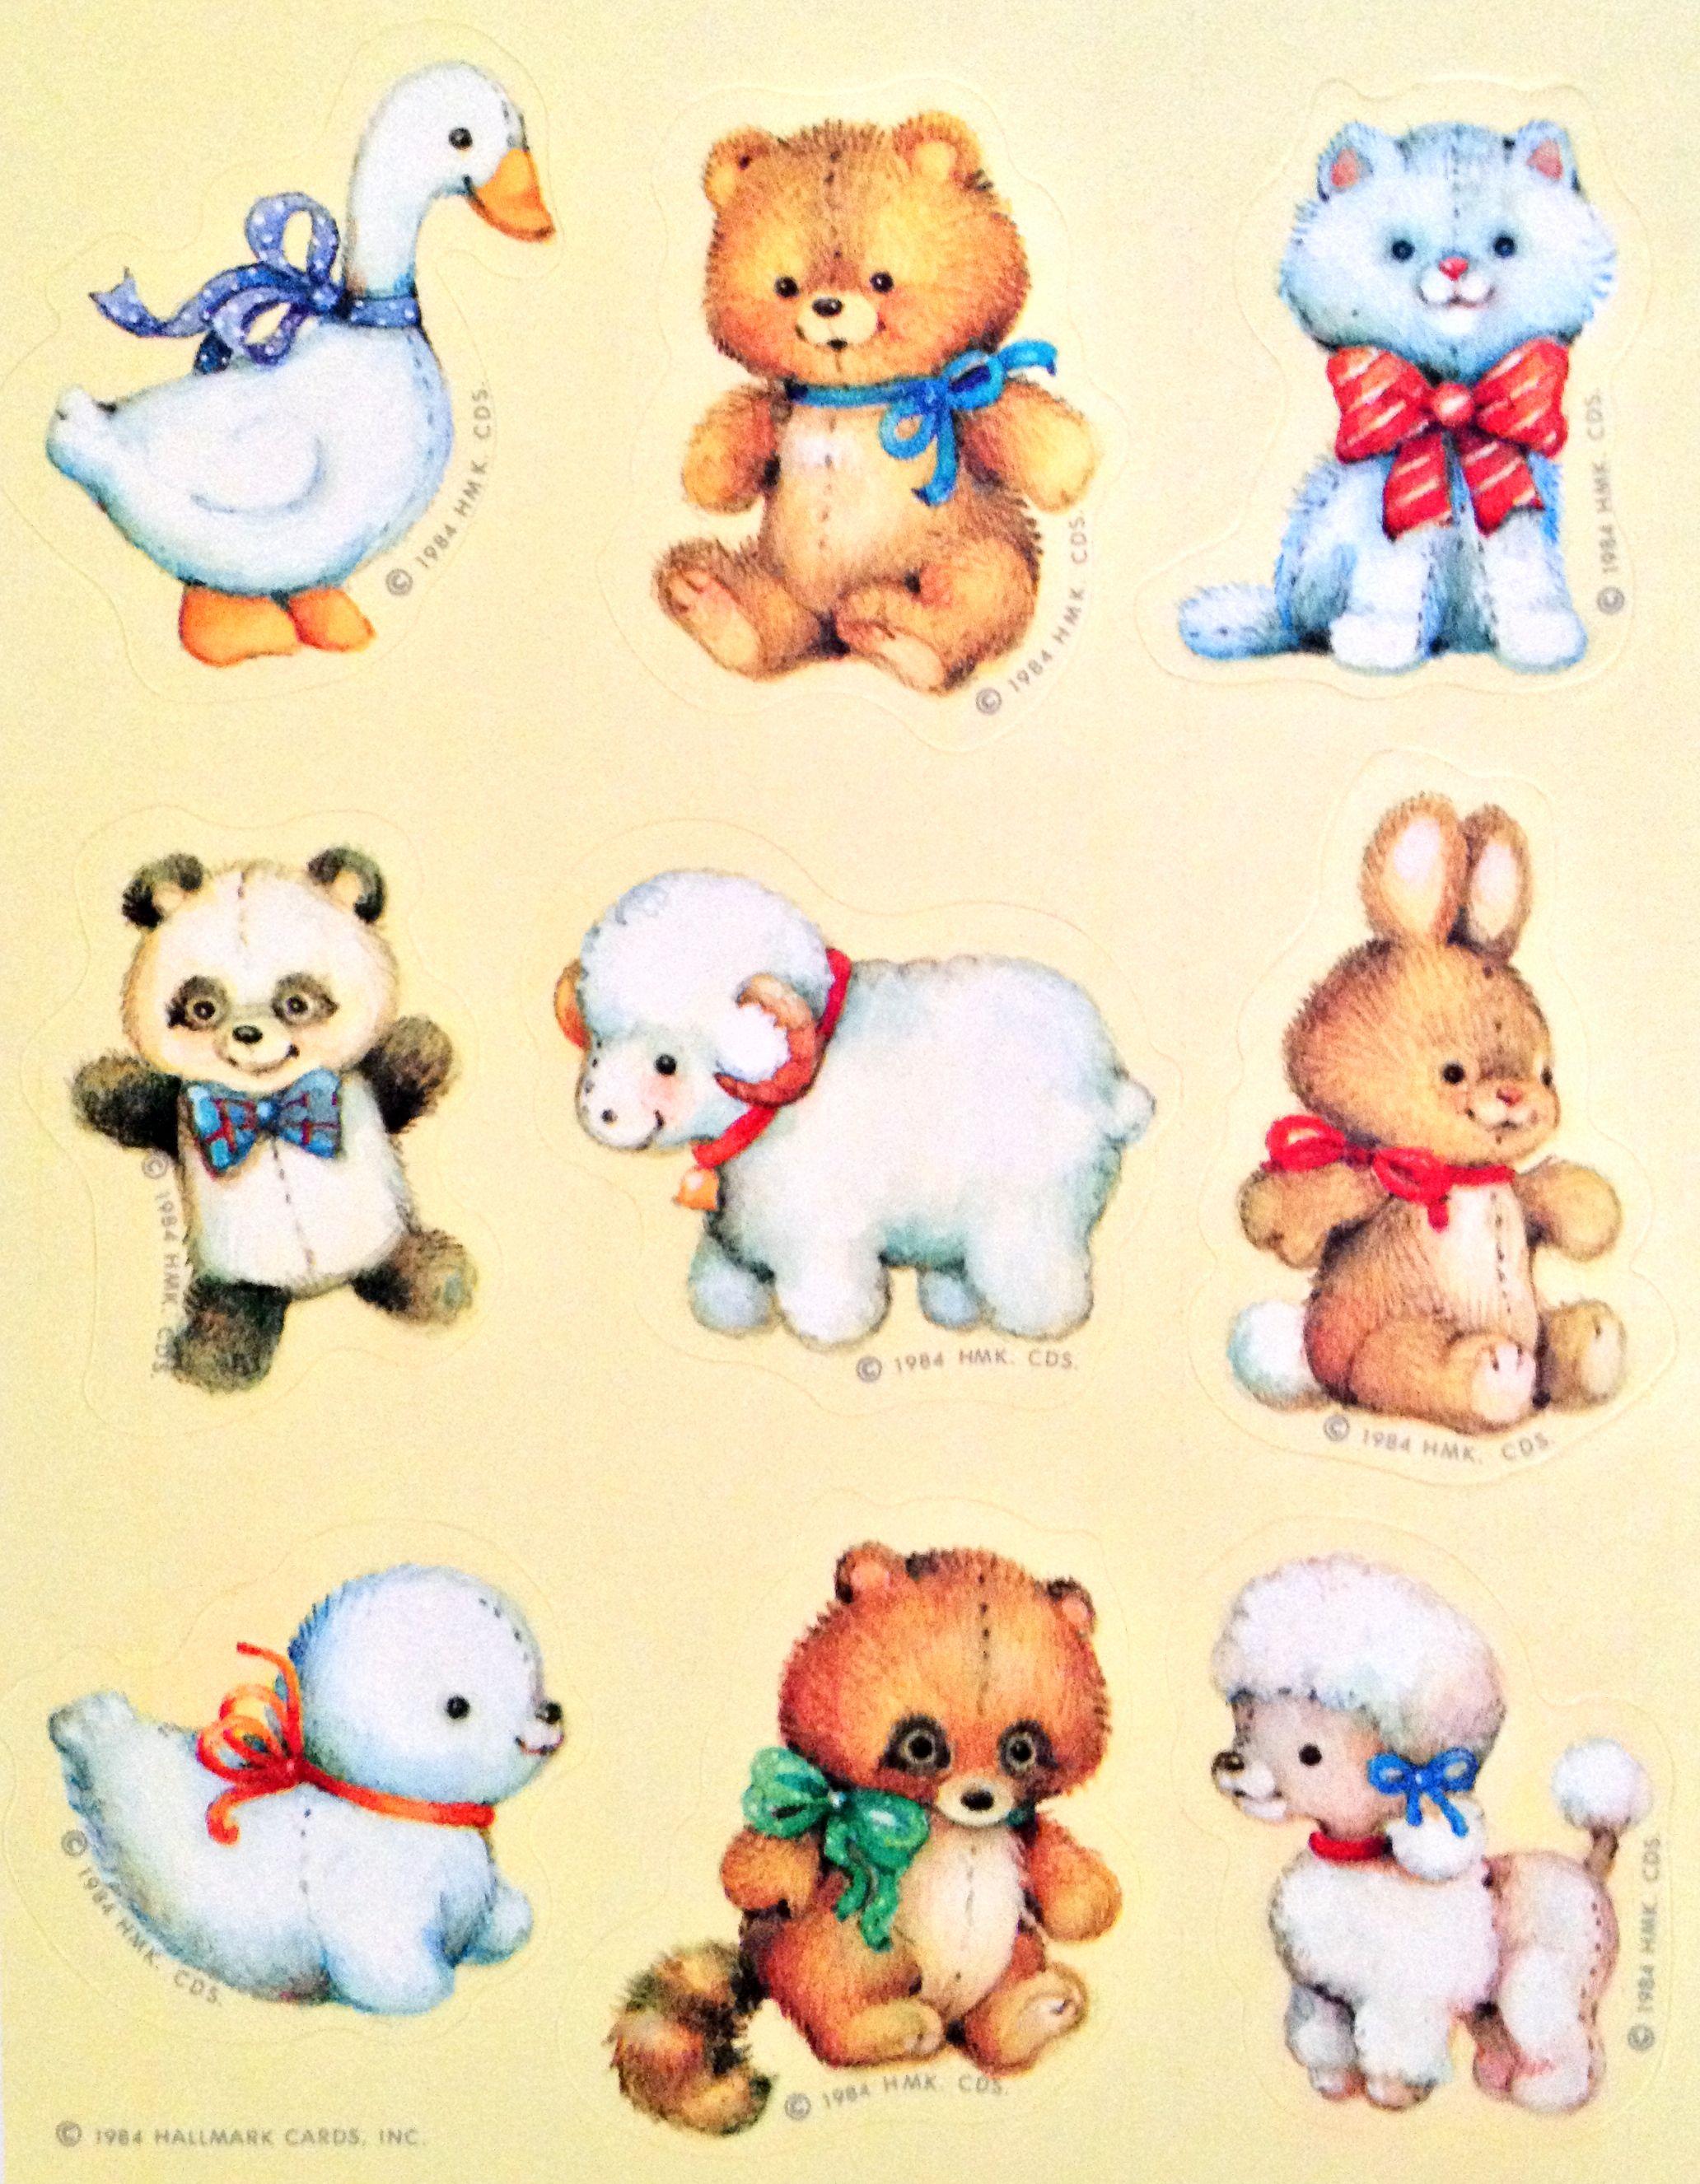 Hallmark Stuffed Animal Stickers Cute StickersAnimal IllustrationsVintage